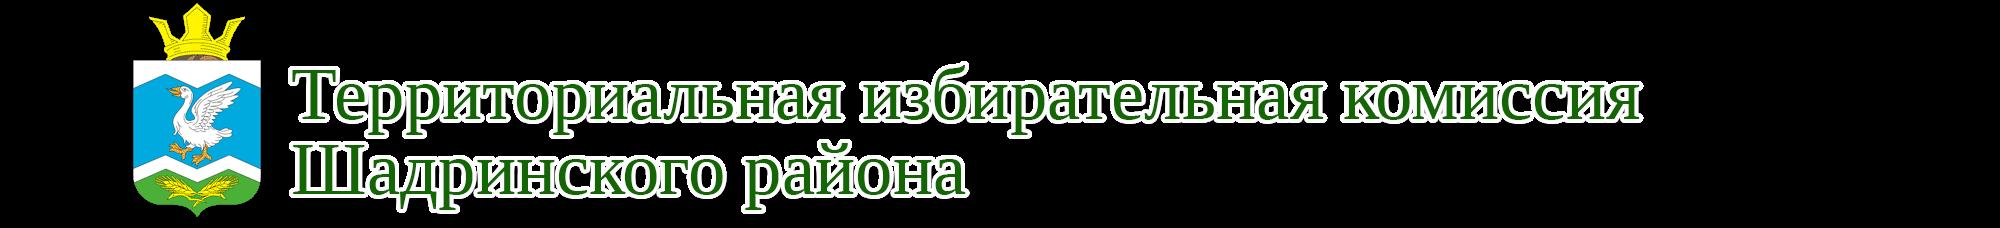 ТИК Шадринского района